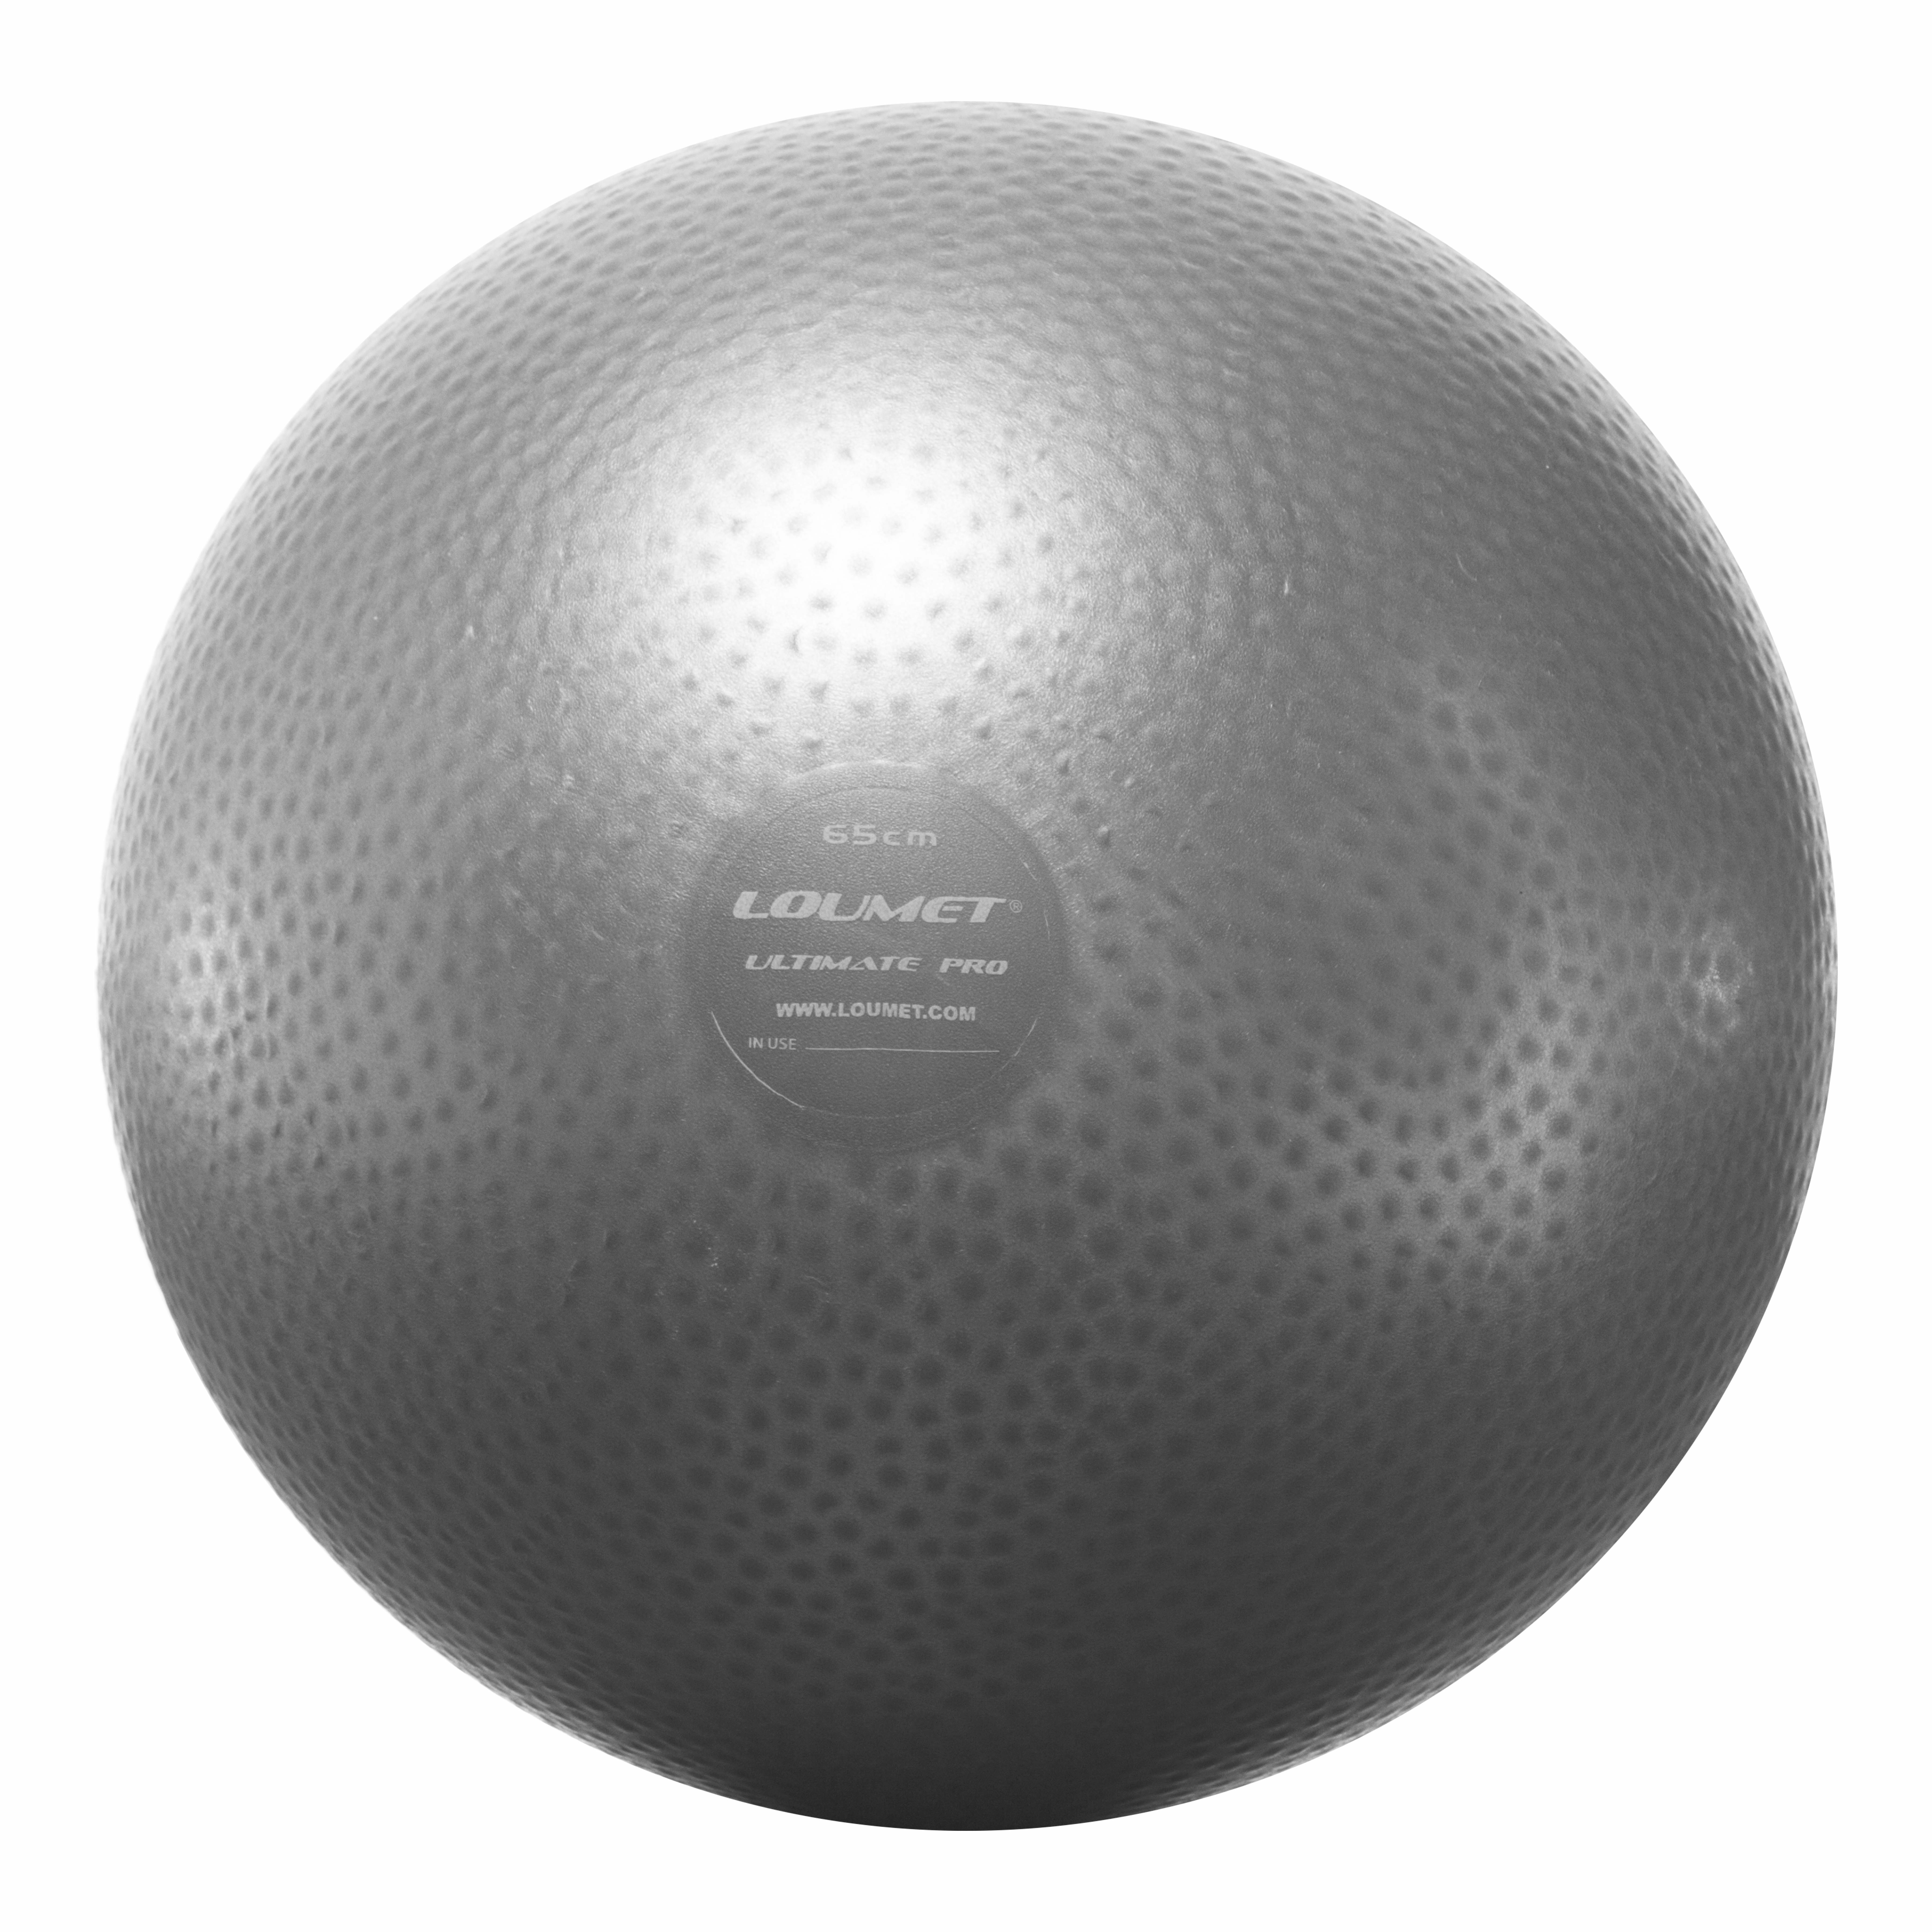 Loumet™ Ultimate Pro 65 cm